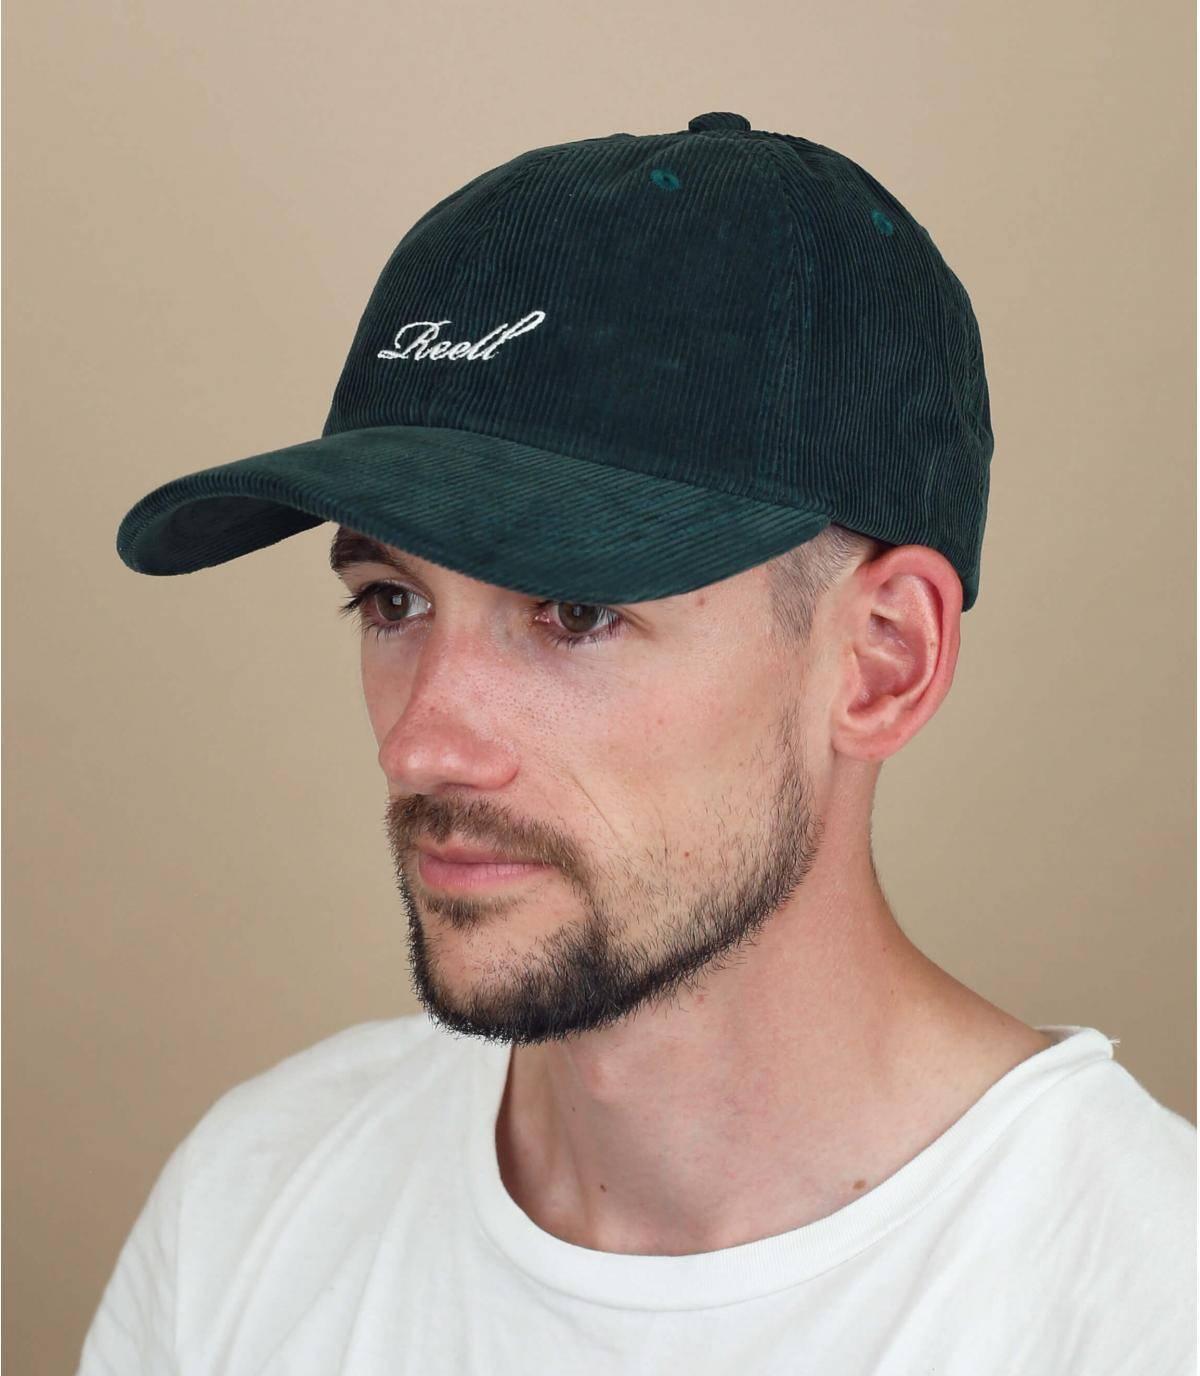 green corduroy Reell cap